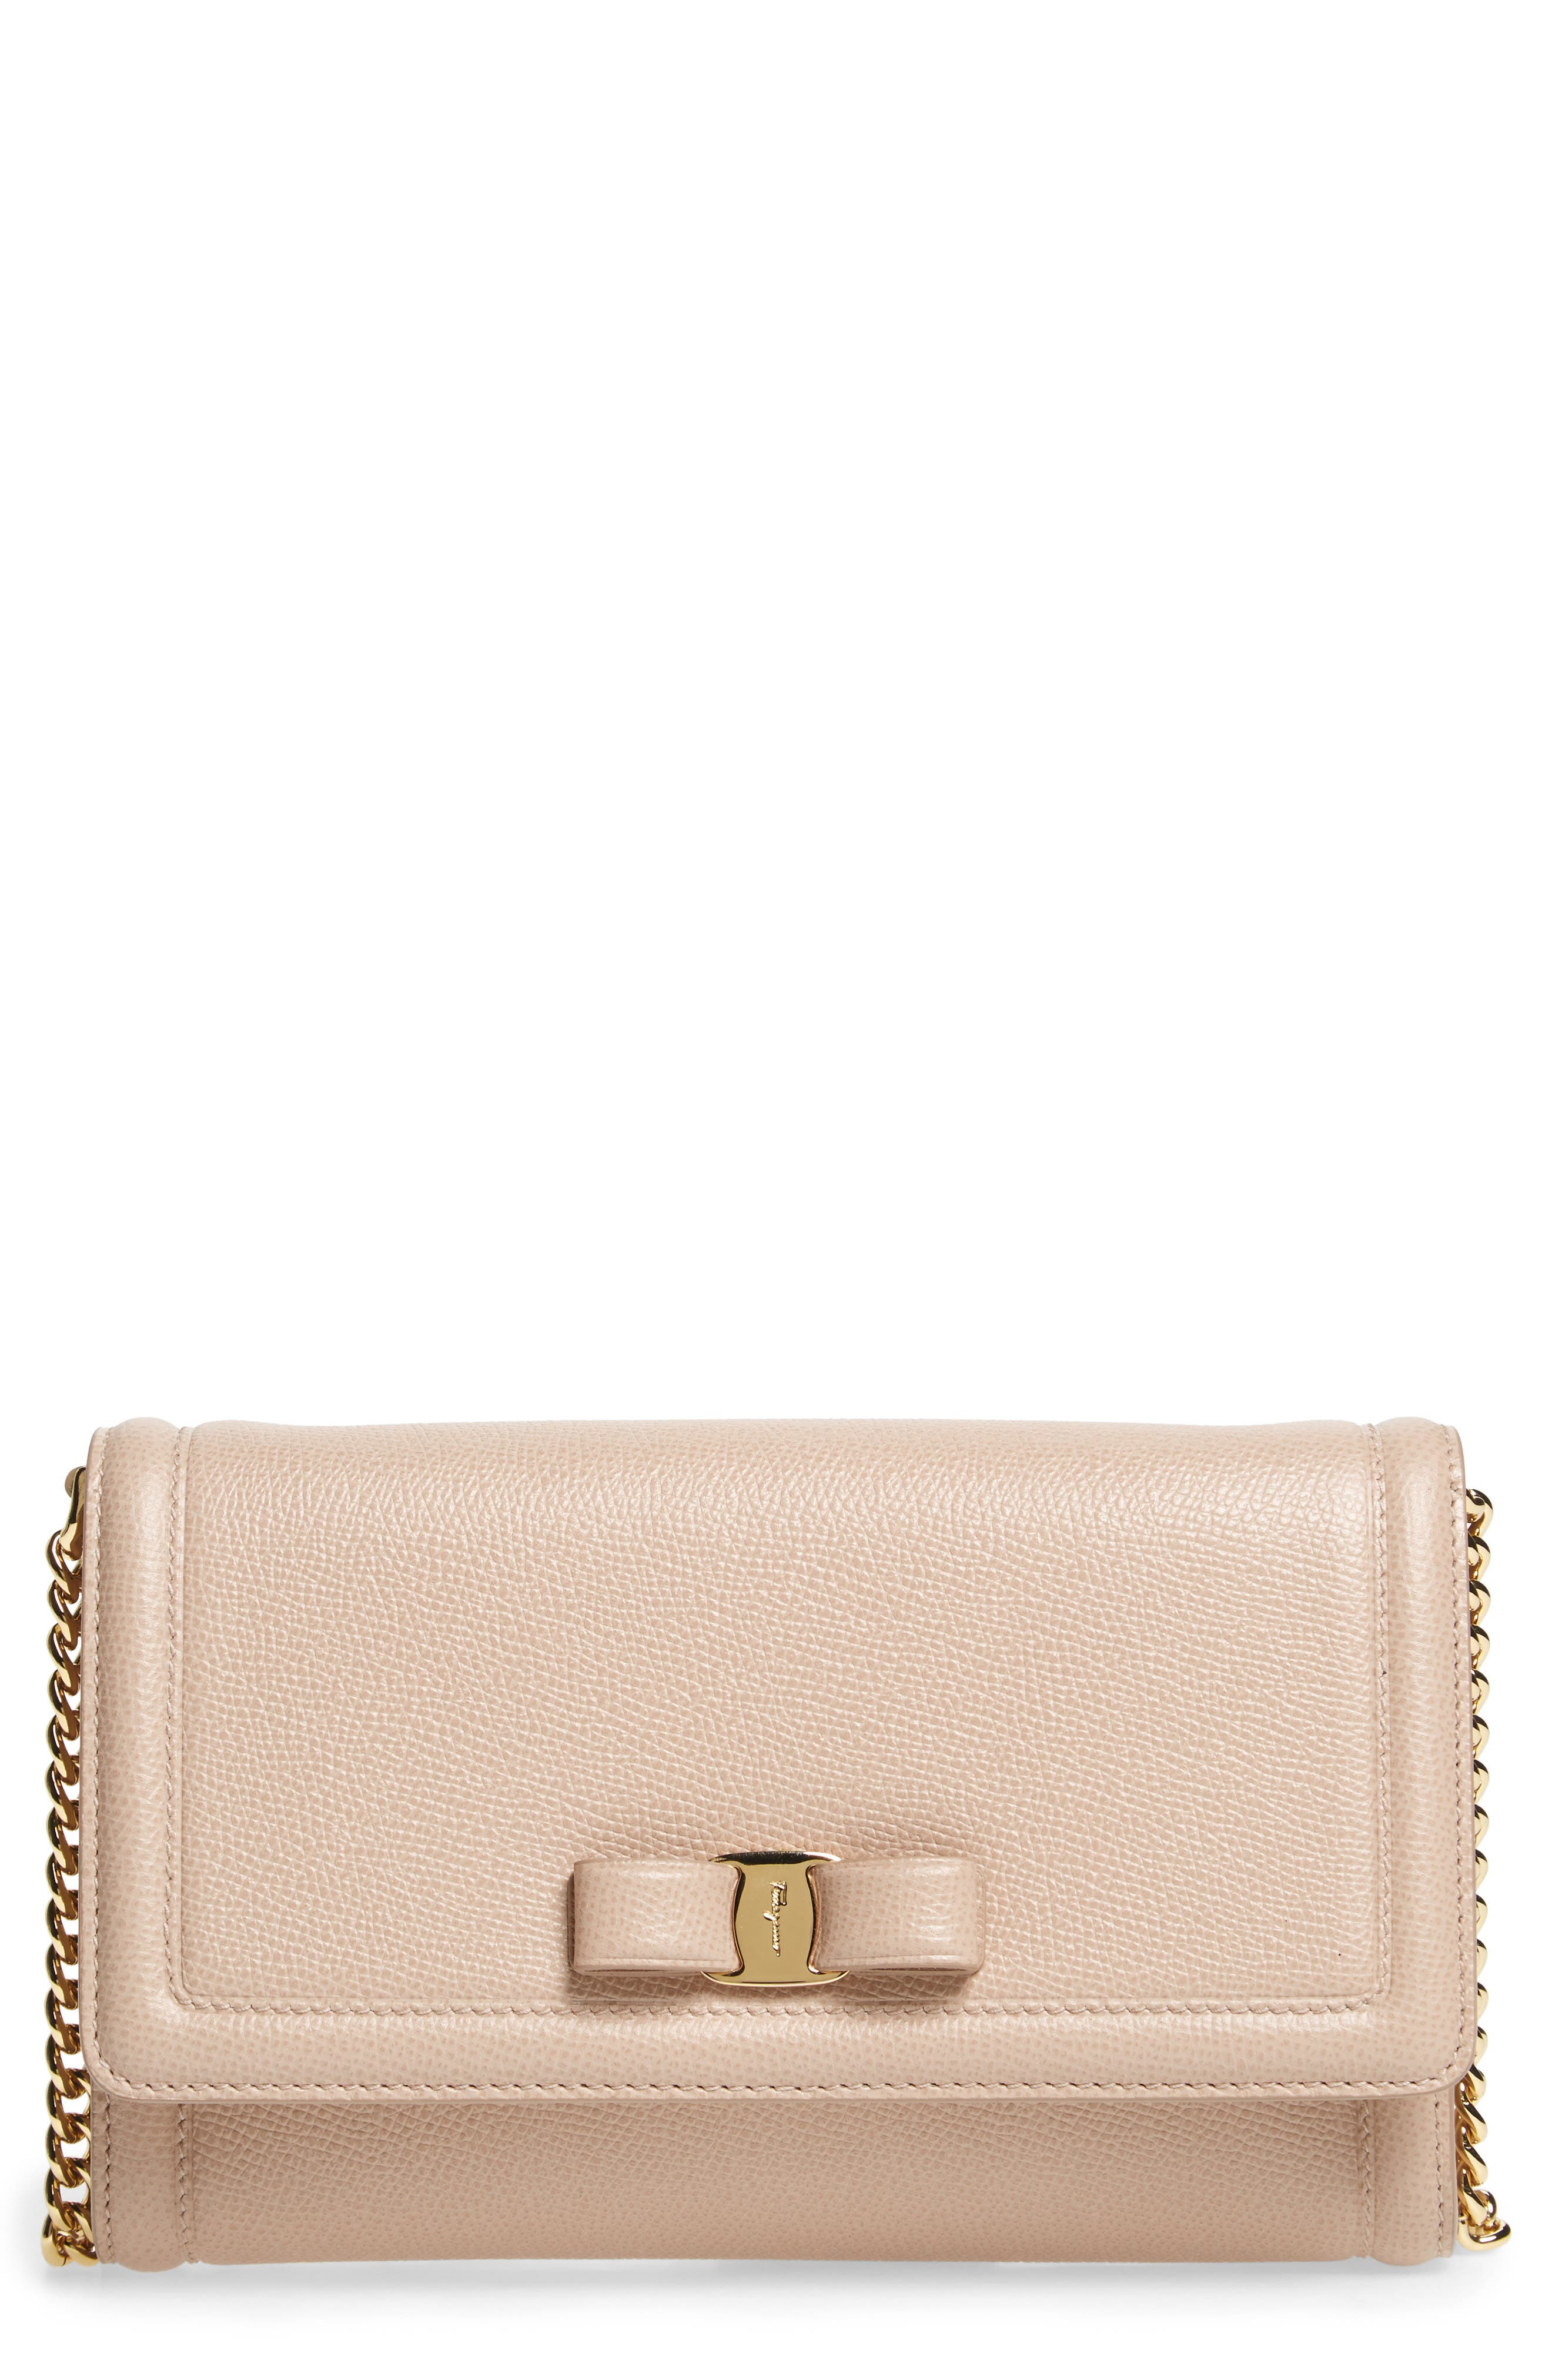 Alternate Image 1 Selected - Salvatore Ferragamo Mini Vara Leather Crossbody Bag